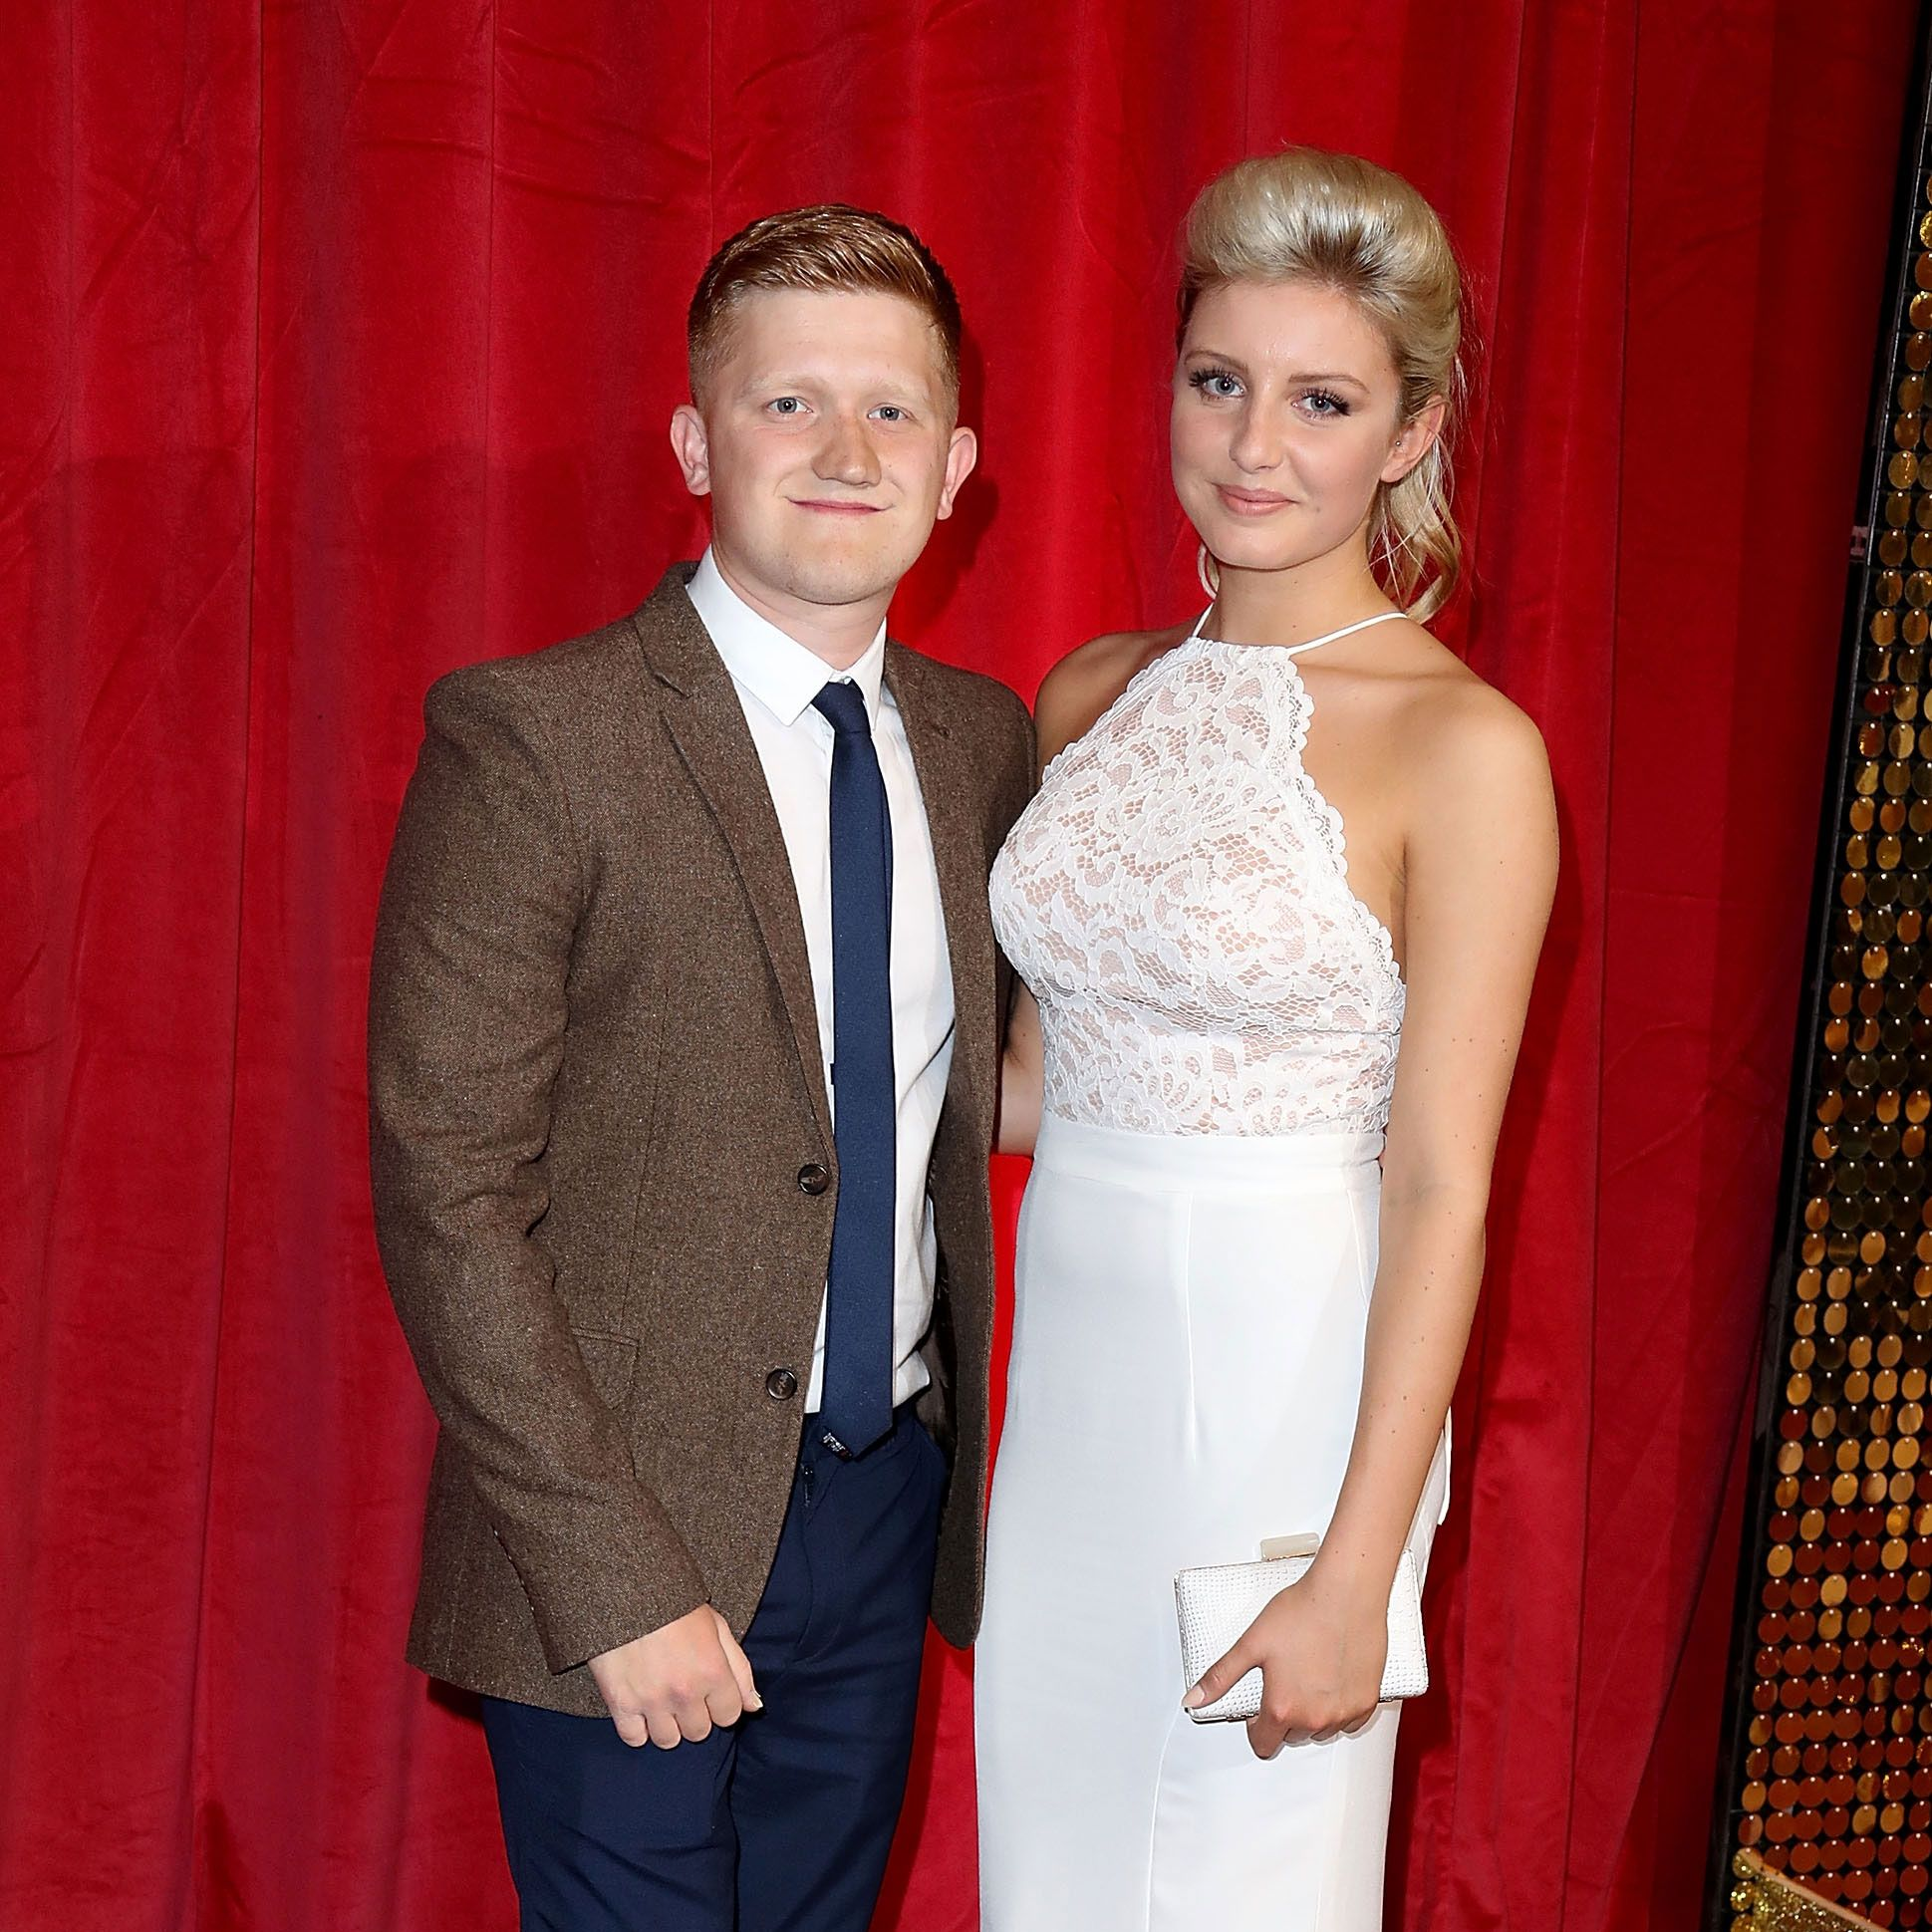 Coronation Street star Sam Aston reveals when he's getting married